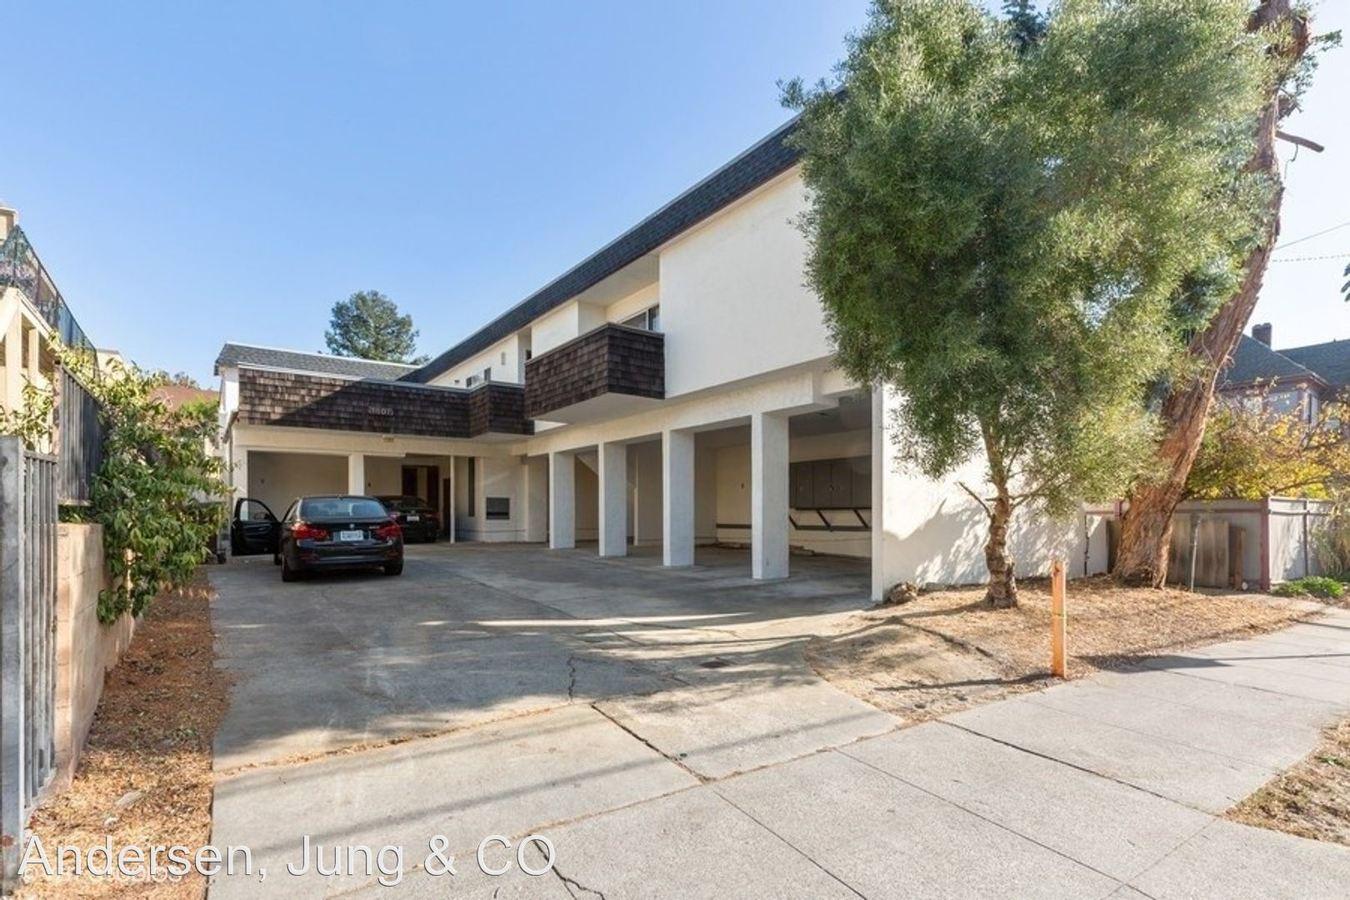 3 Bedrooms 1 Bathroom Apartment for rent at 1607 Milvia Street in Berkeley, CA